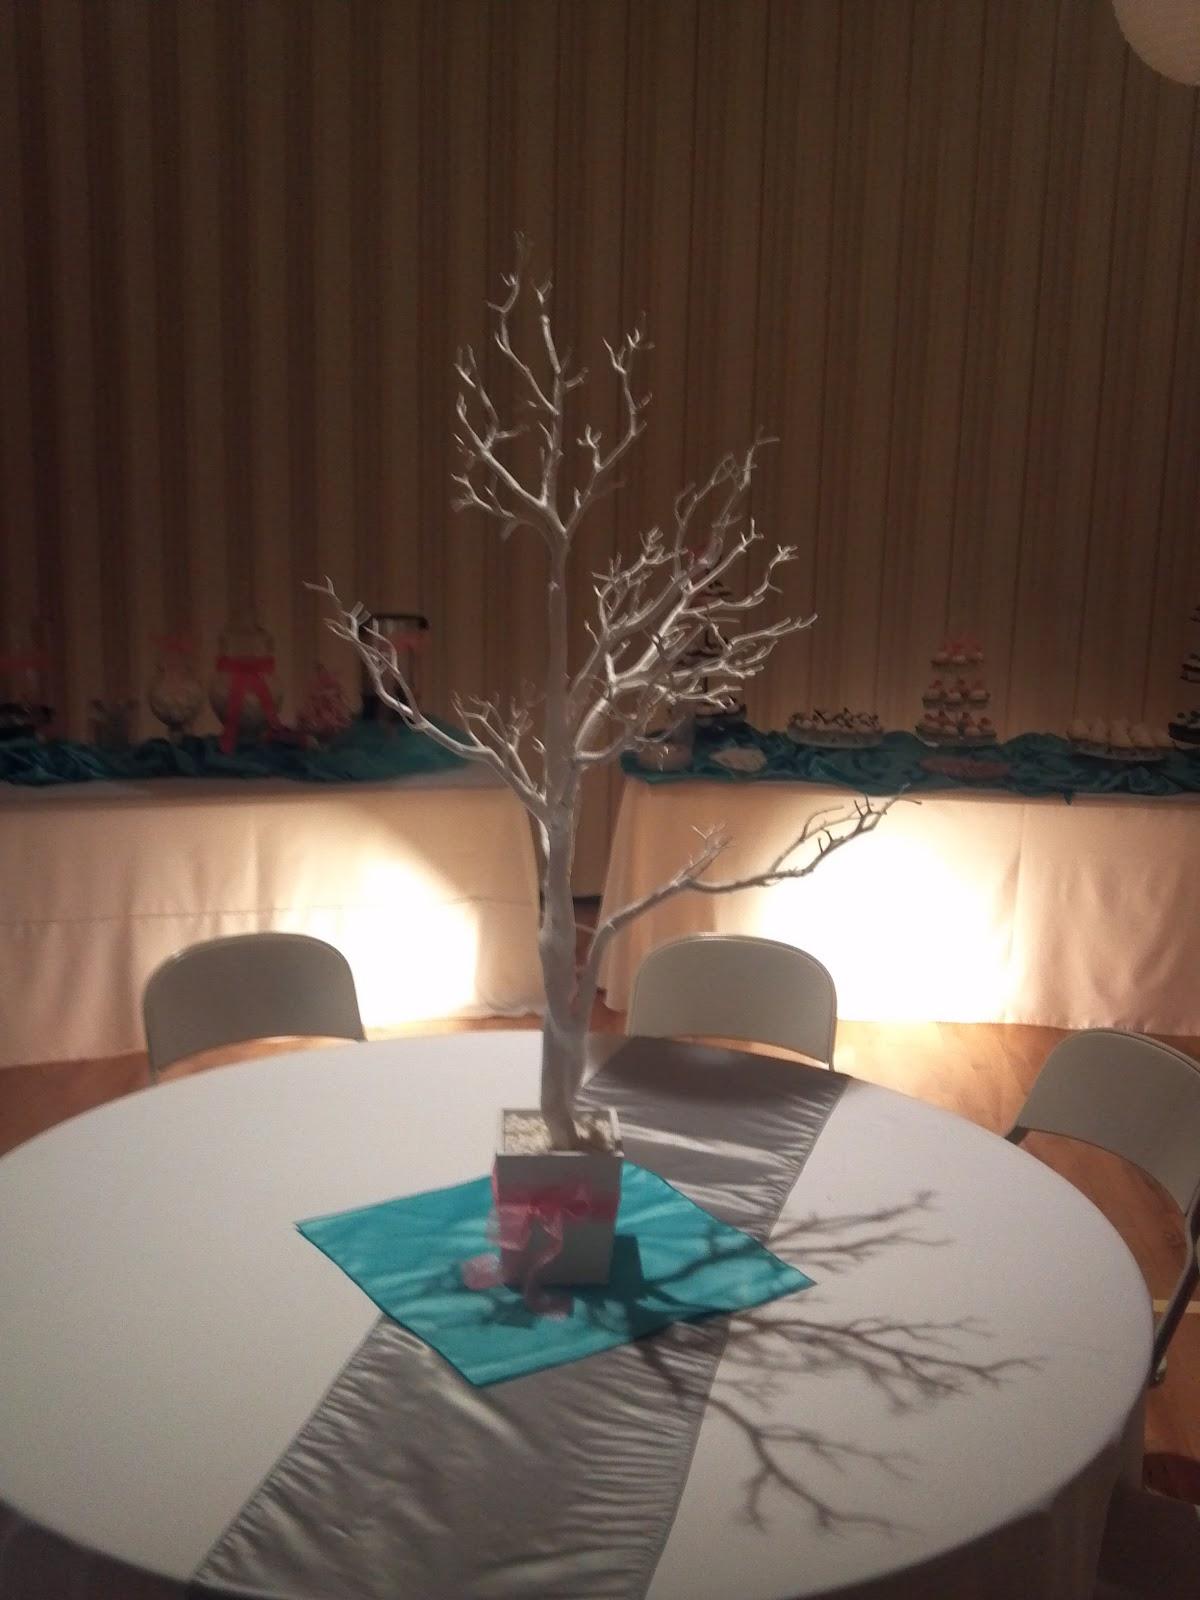 UWeddings: Coral and Tiffany Blue Wedding